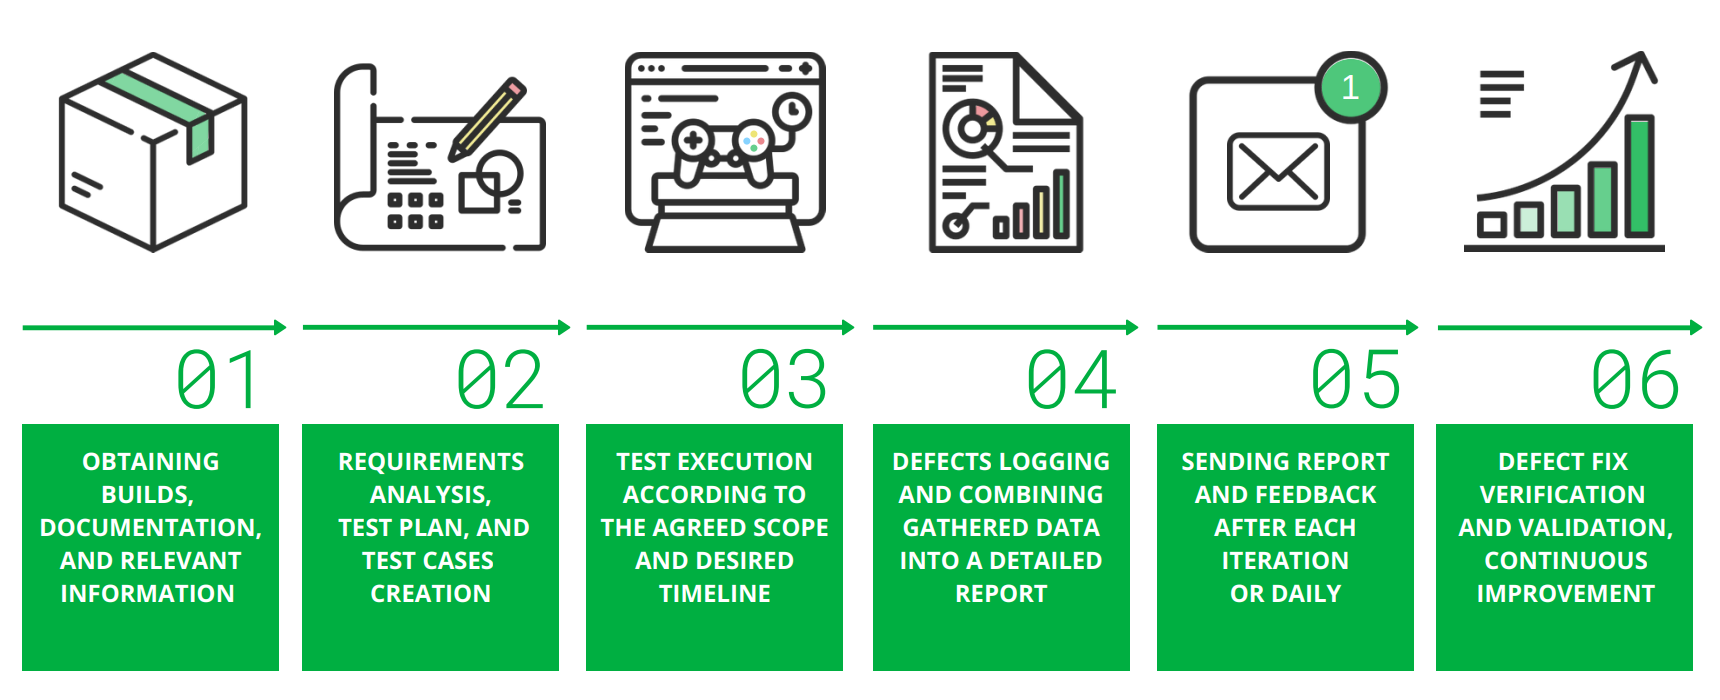 The 6 steps to start QA